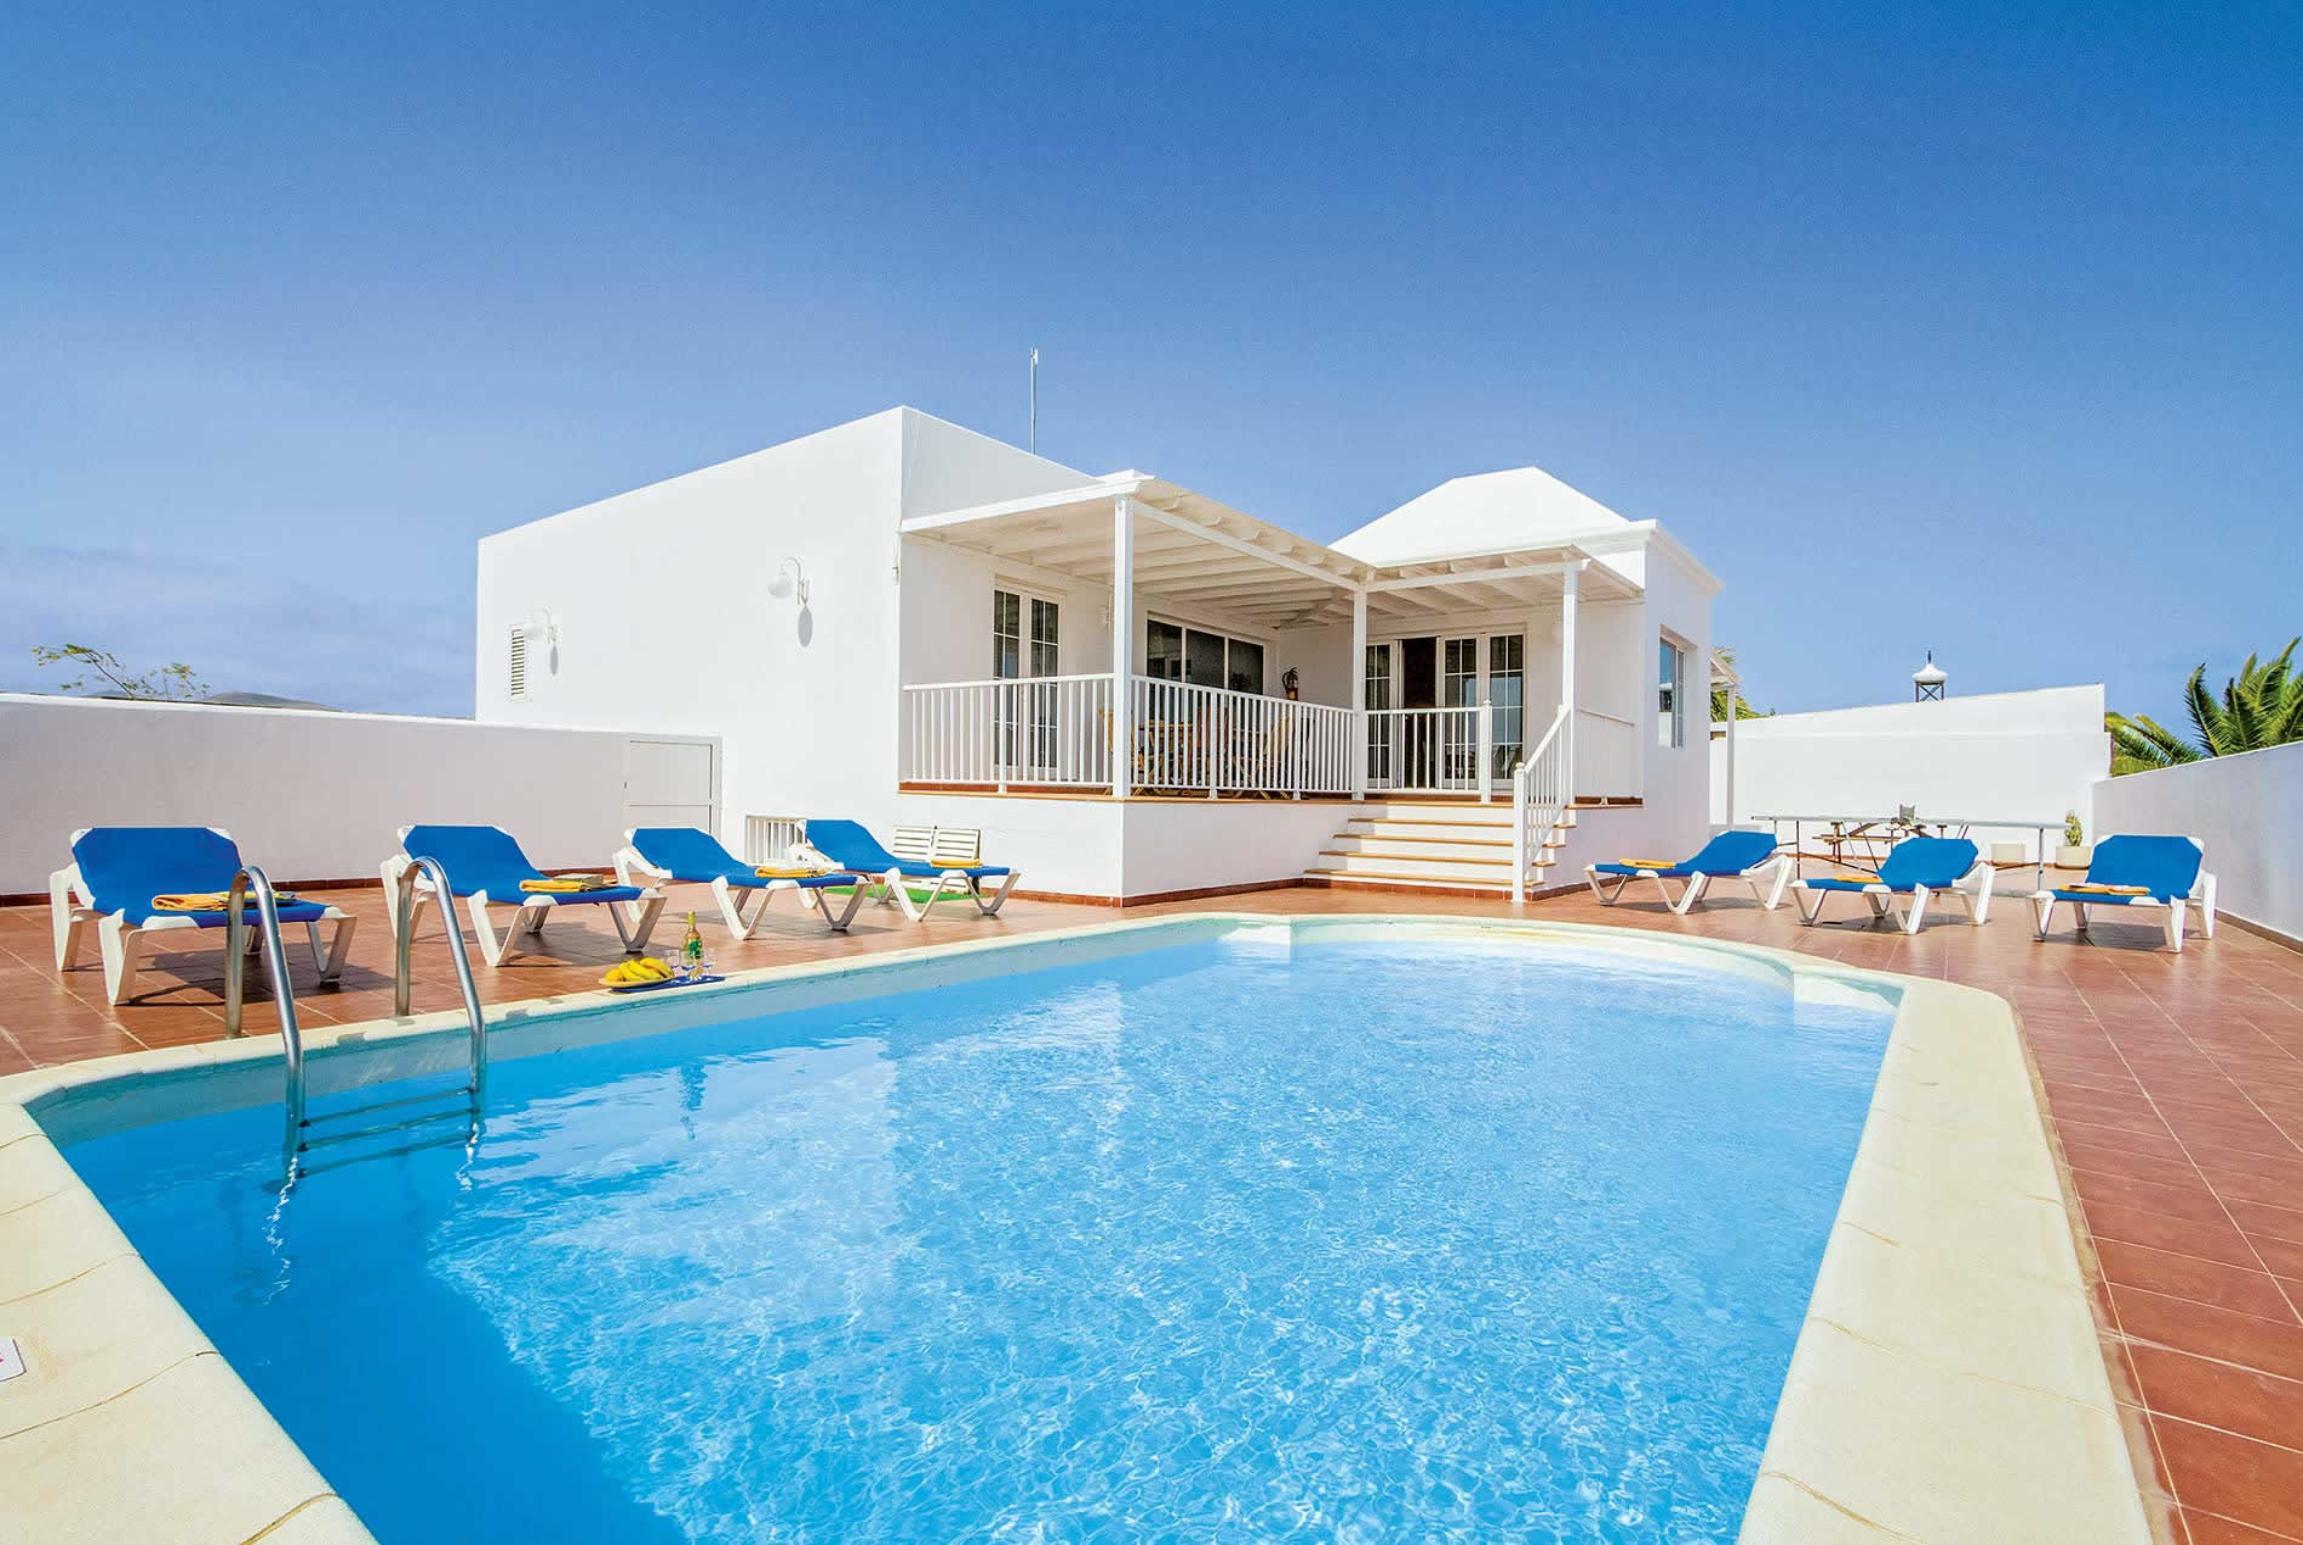 Ferienhaus Casa Candela (2654390), Puerto del Carmen, Lanzarote, Kanarische Inseln, Spanien, Bild 1